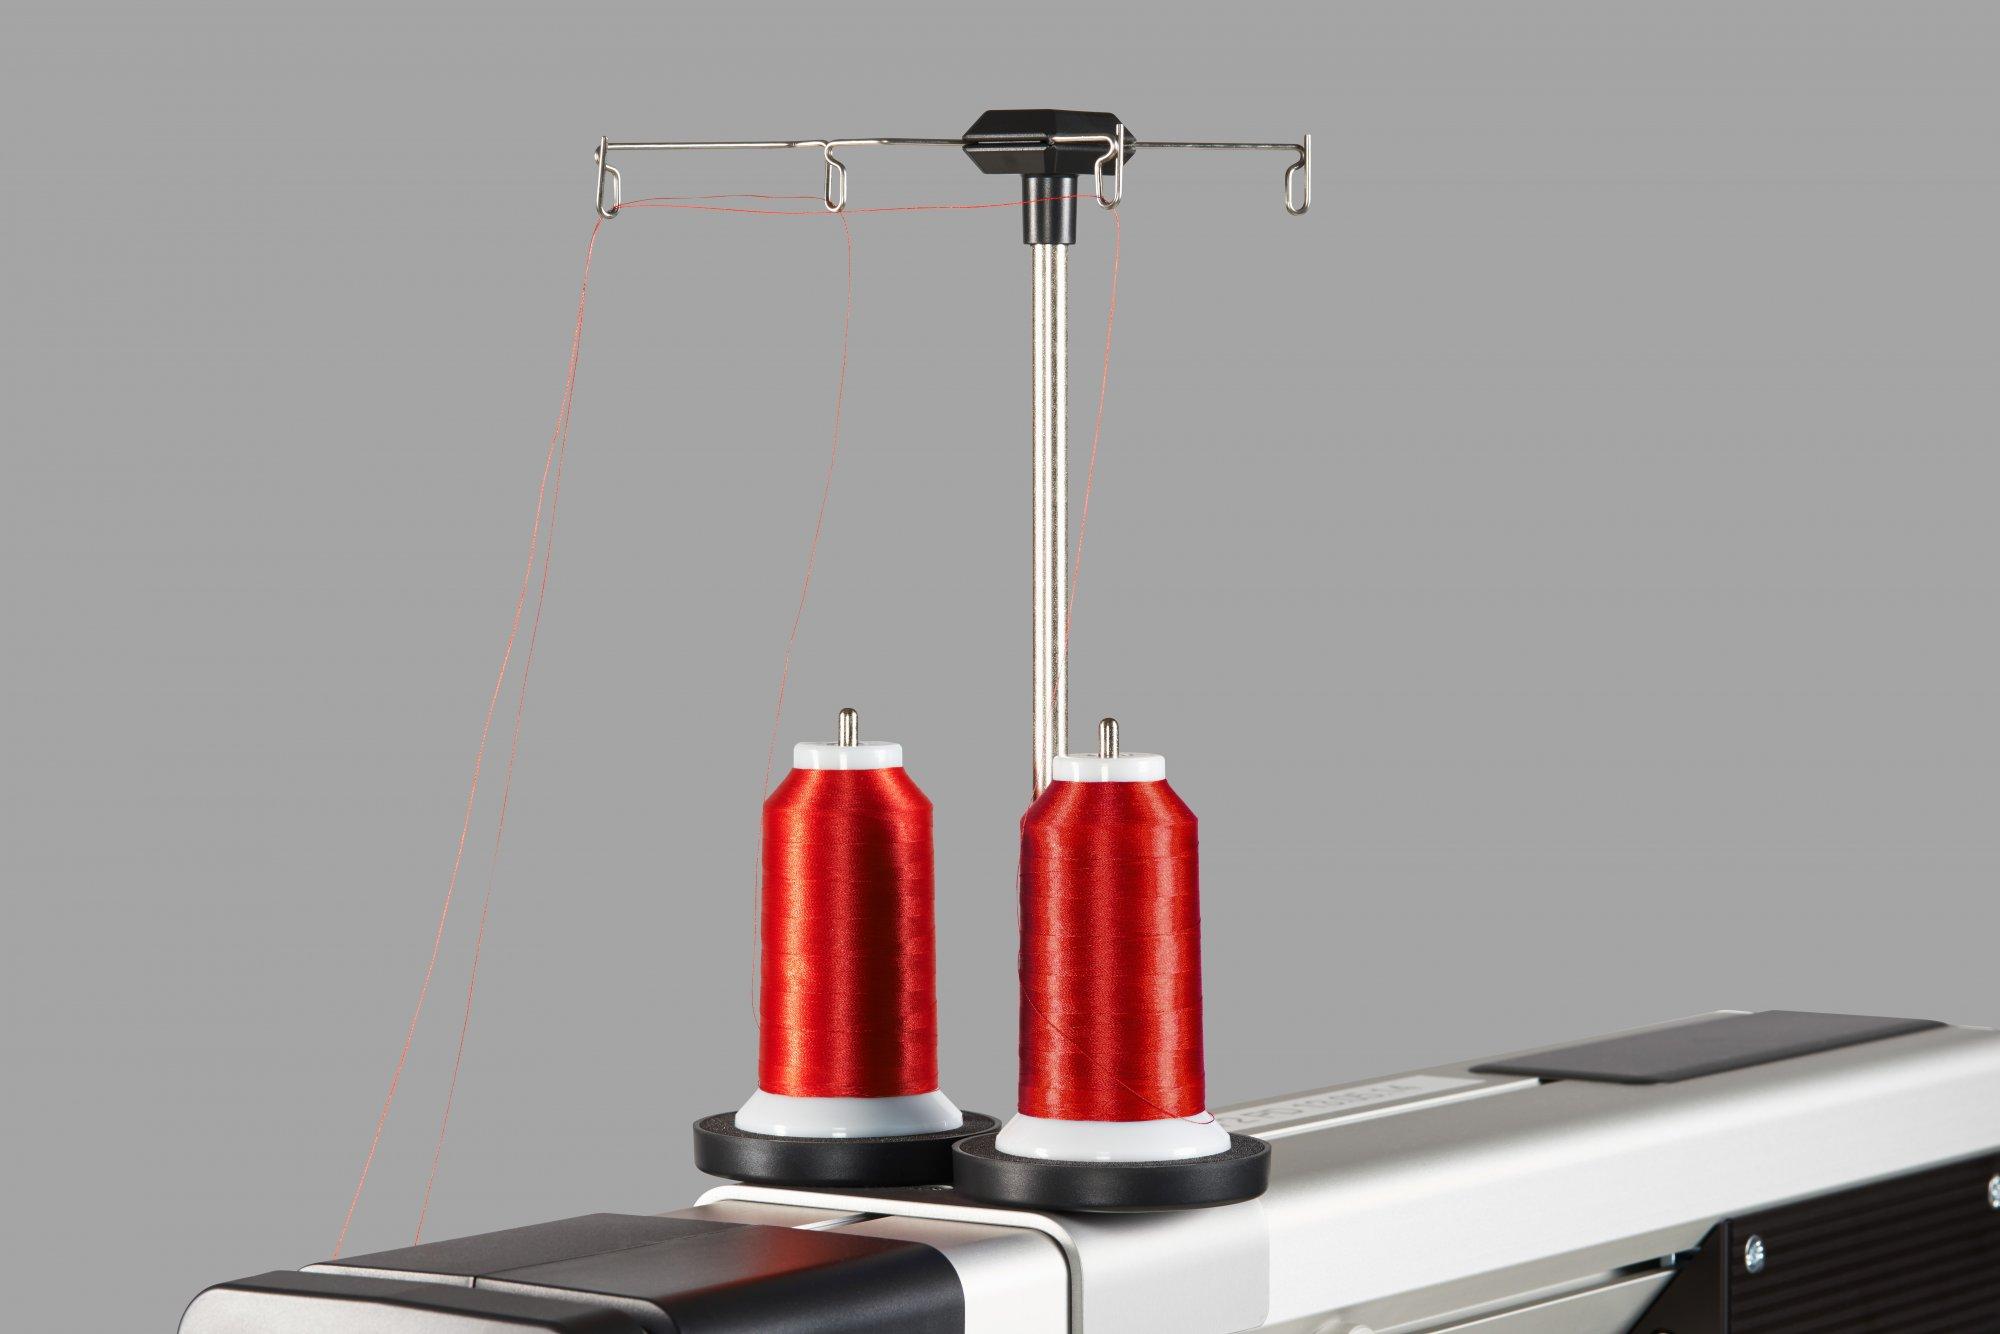 Vertical Spool Holder Q Longarm